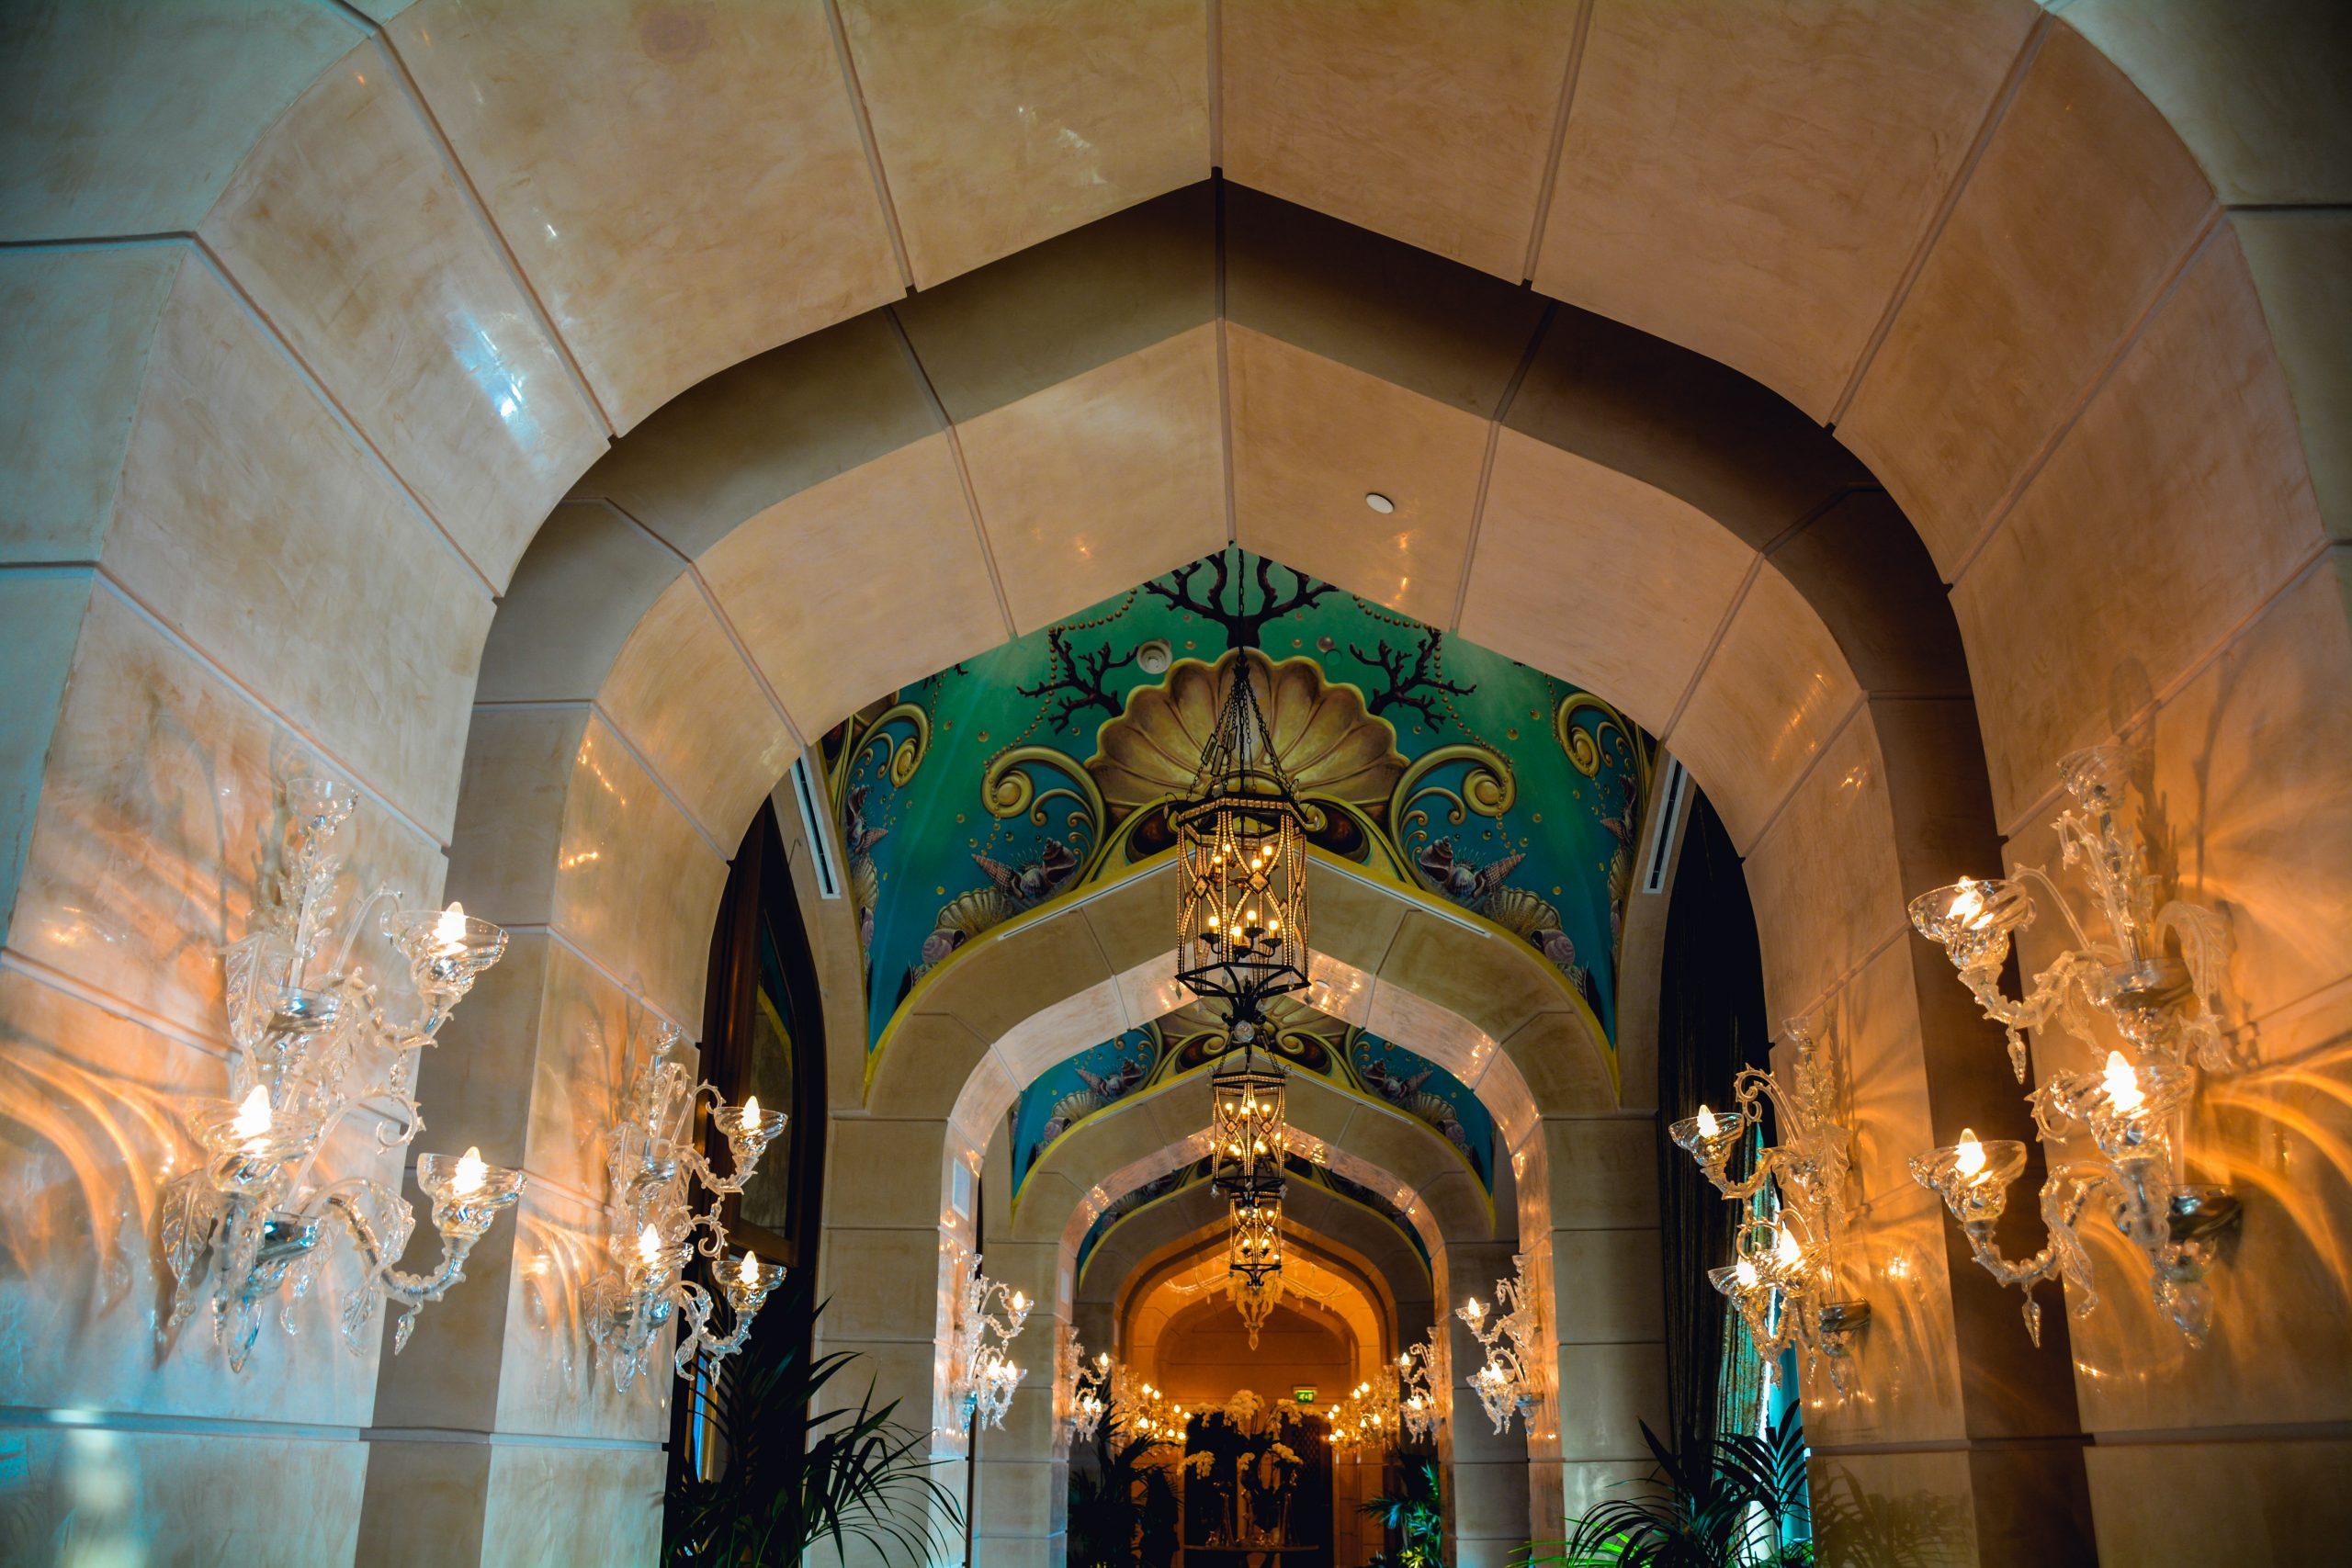 Interior decorative lights of a building